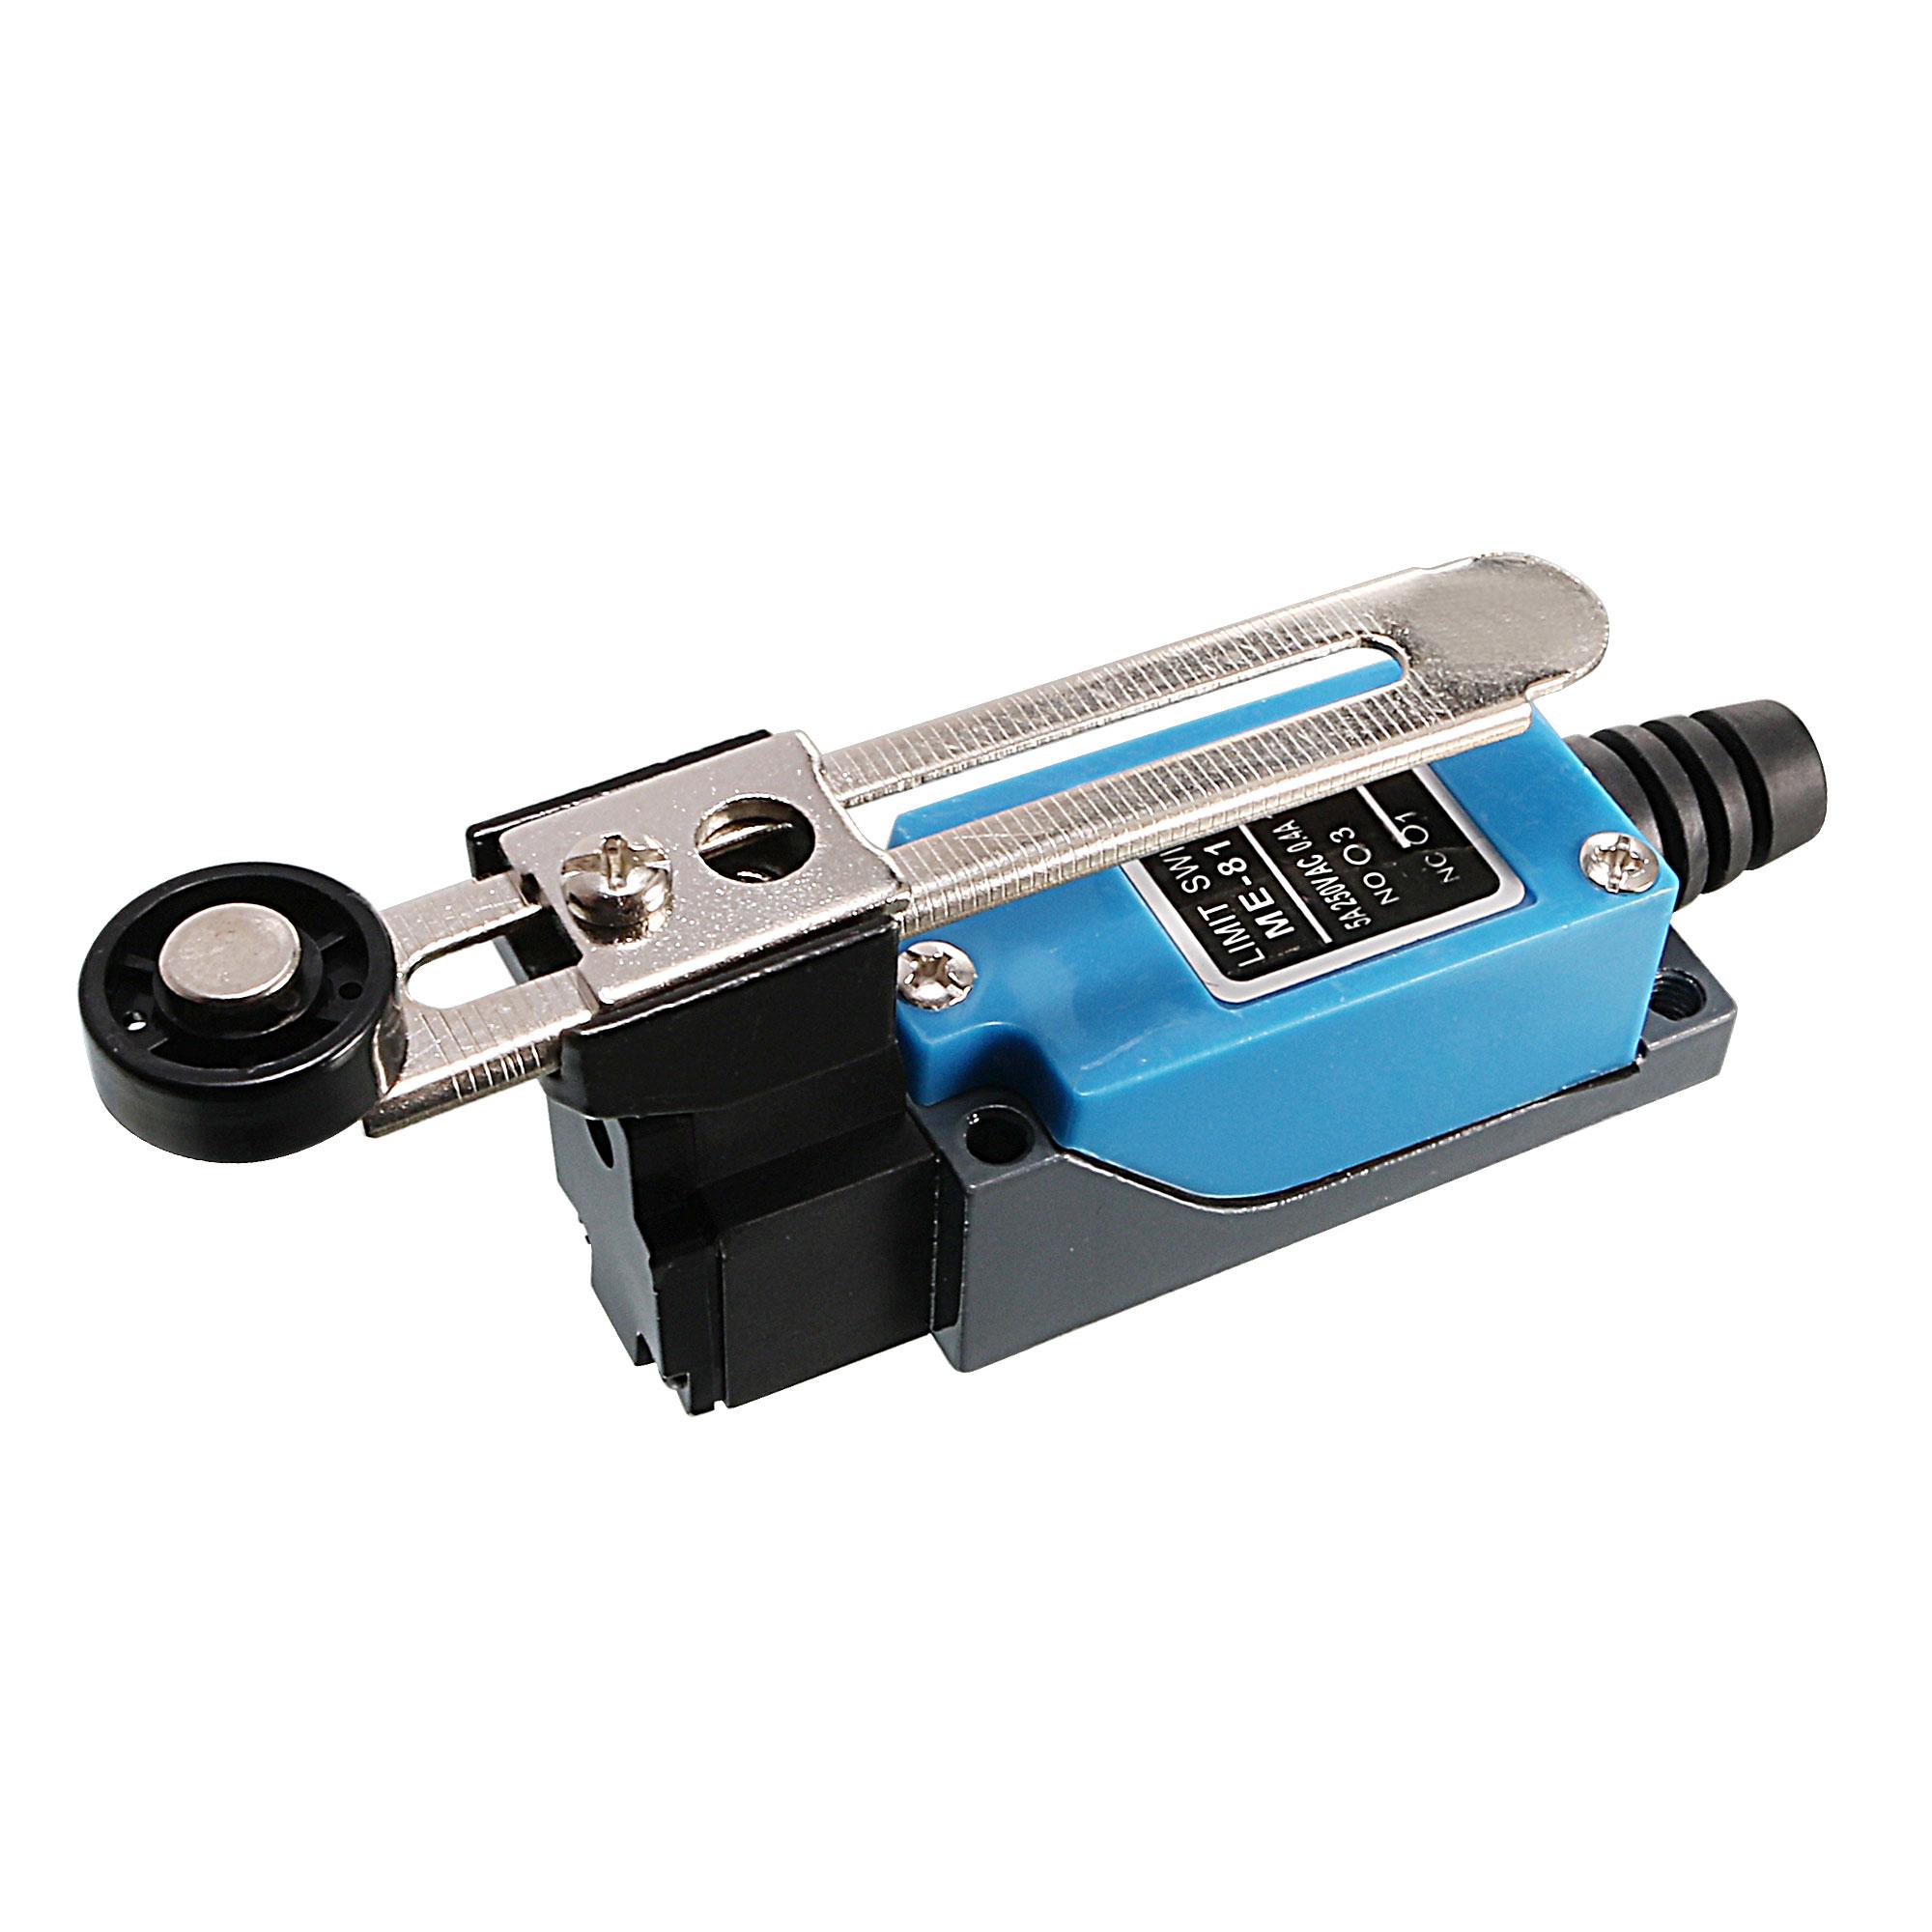 Metallic Roller Arm Type AC Limit Switch for CNC Mill Plasma ME-8108